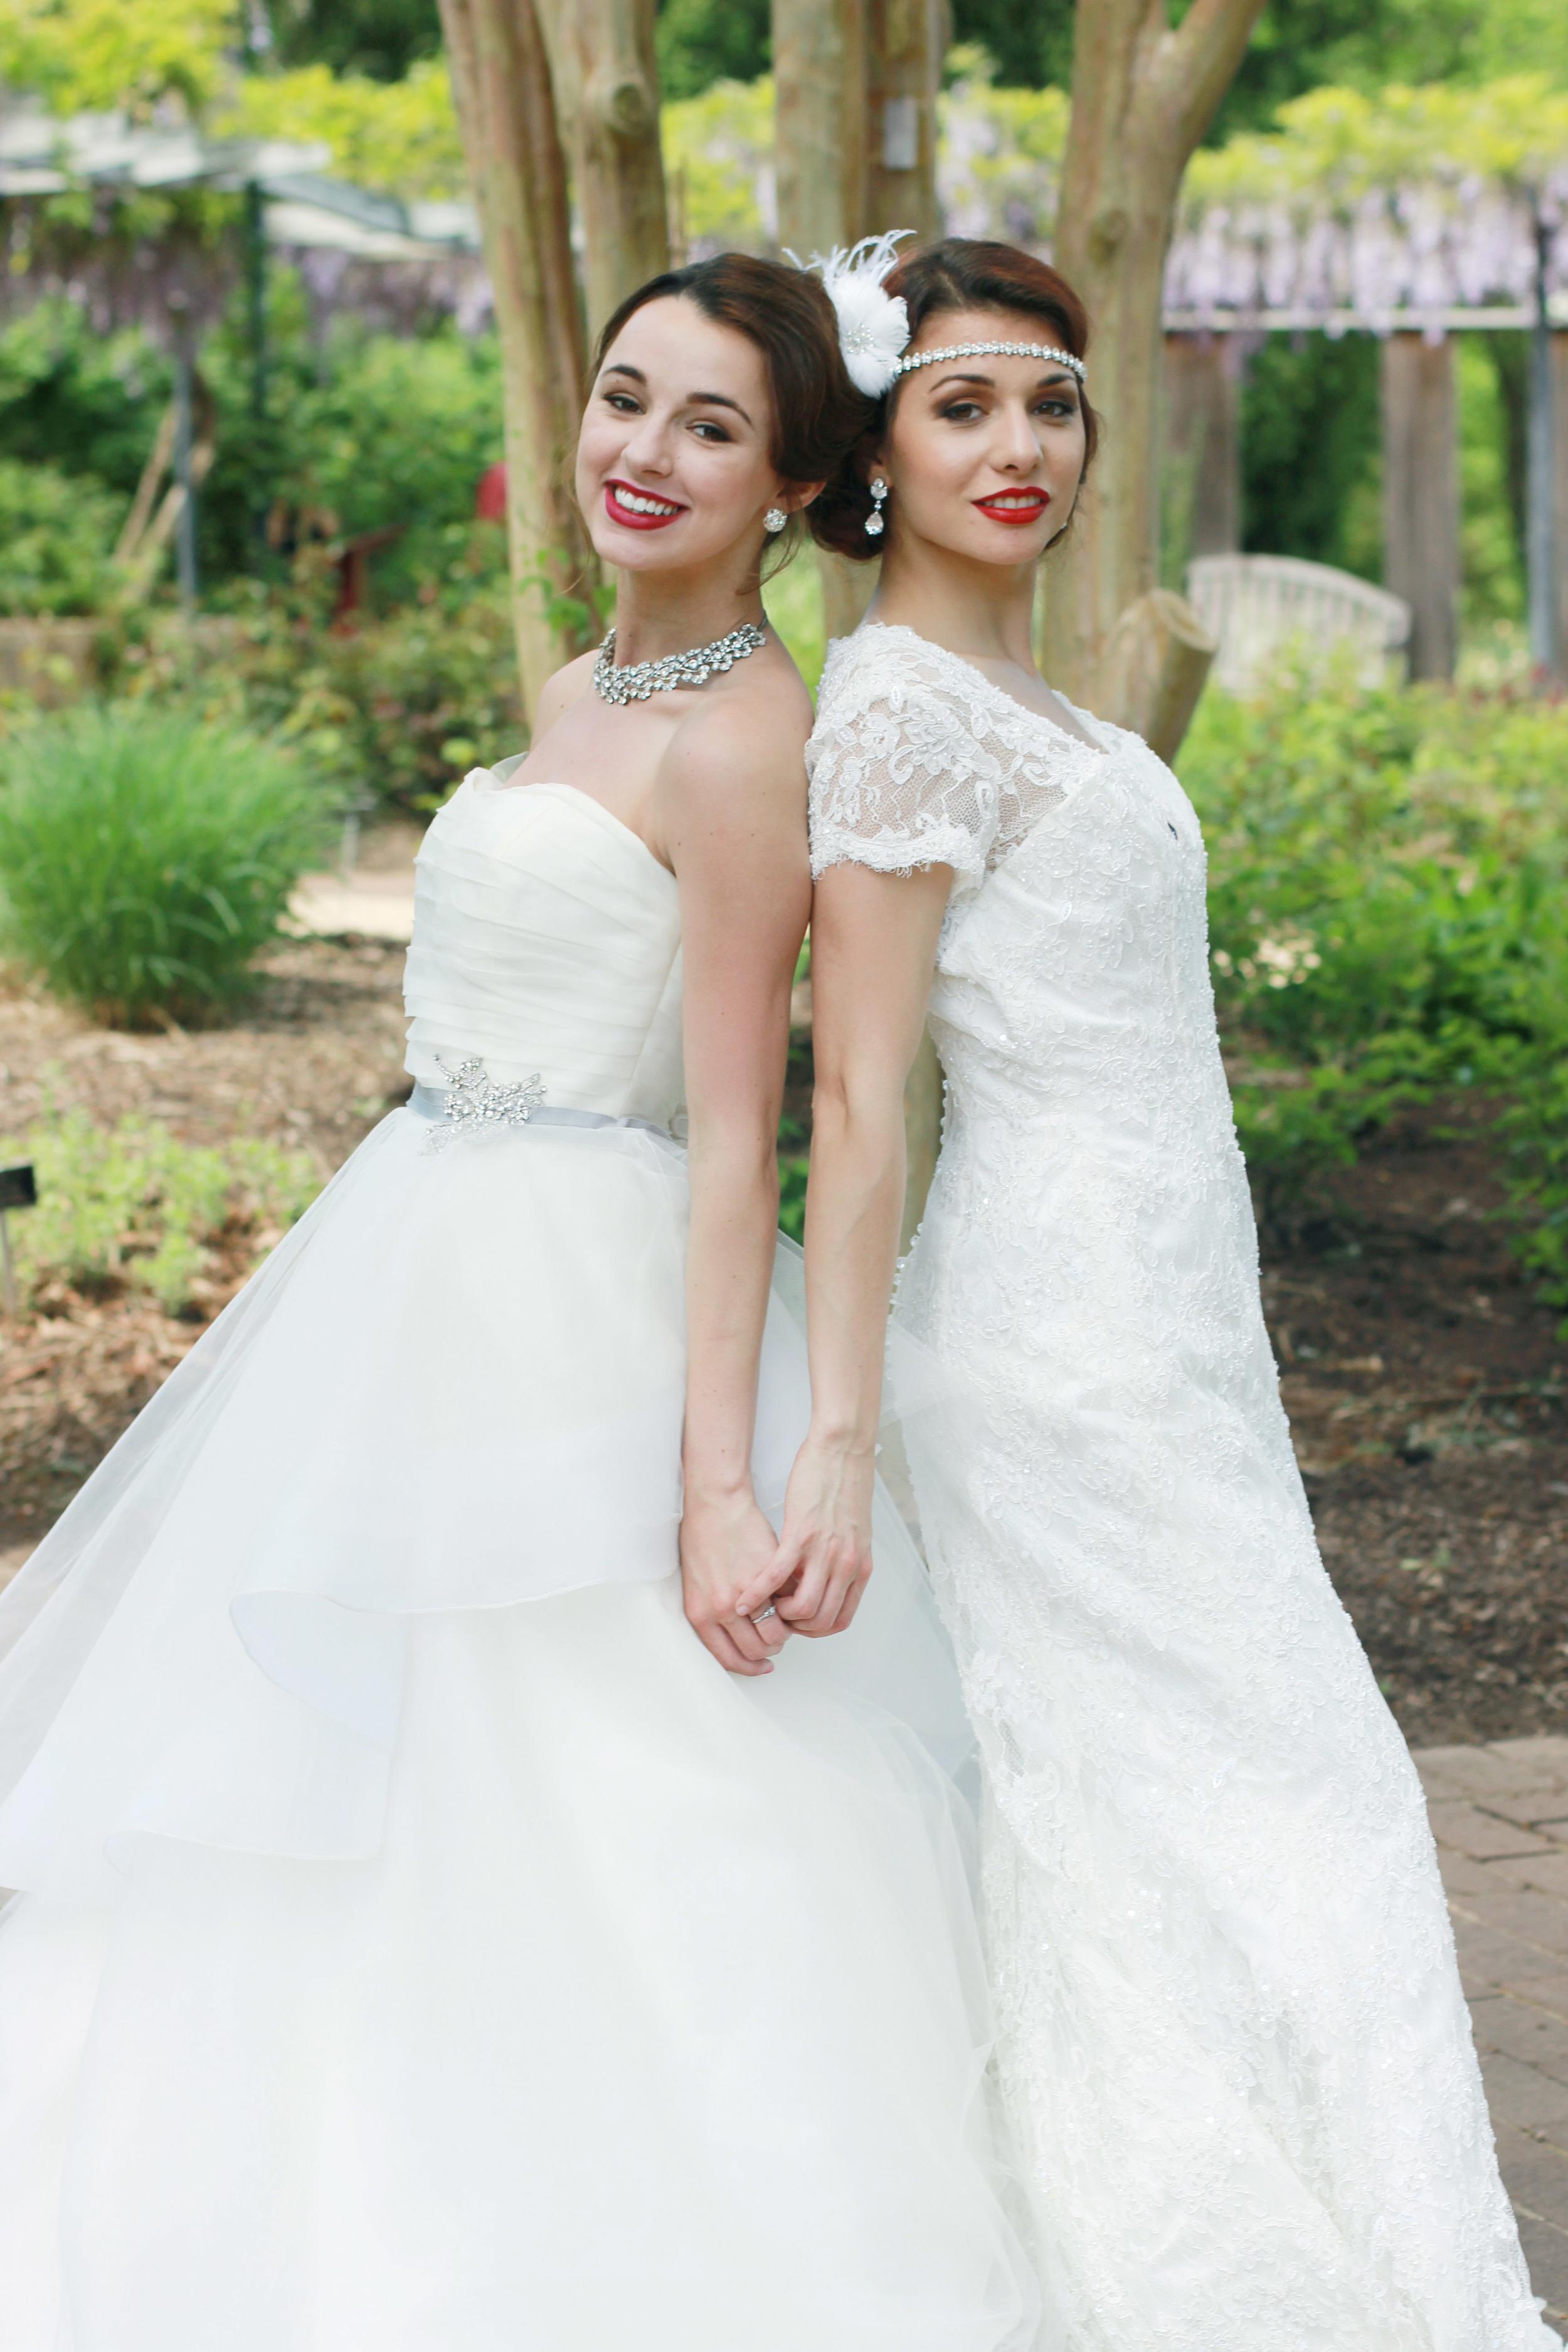 Vintage Glamour Wedding | Same Sex Couple - Jess Rudolph Photography